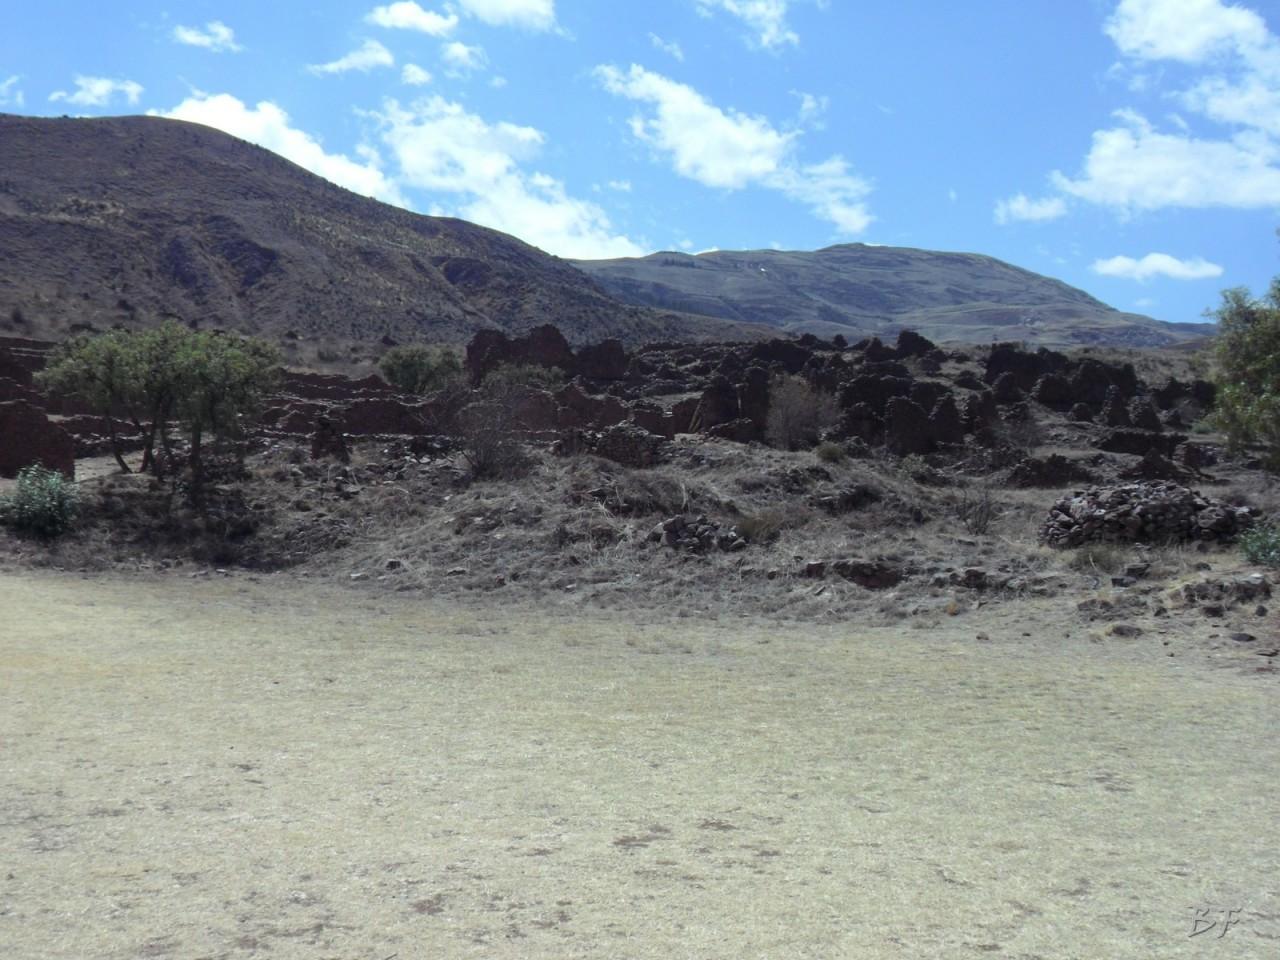 Parco-Archeologico-Megaliti-Pikillacta-Andahuaylillas-Cusco-Perù-17